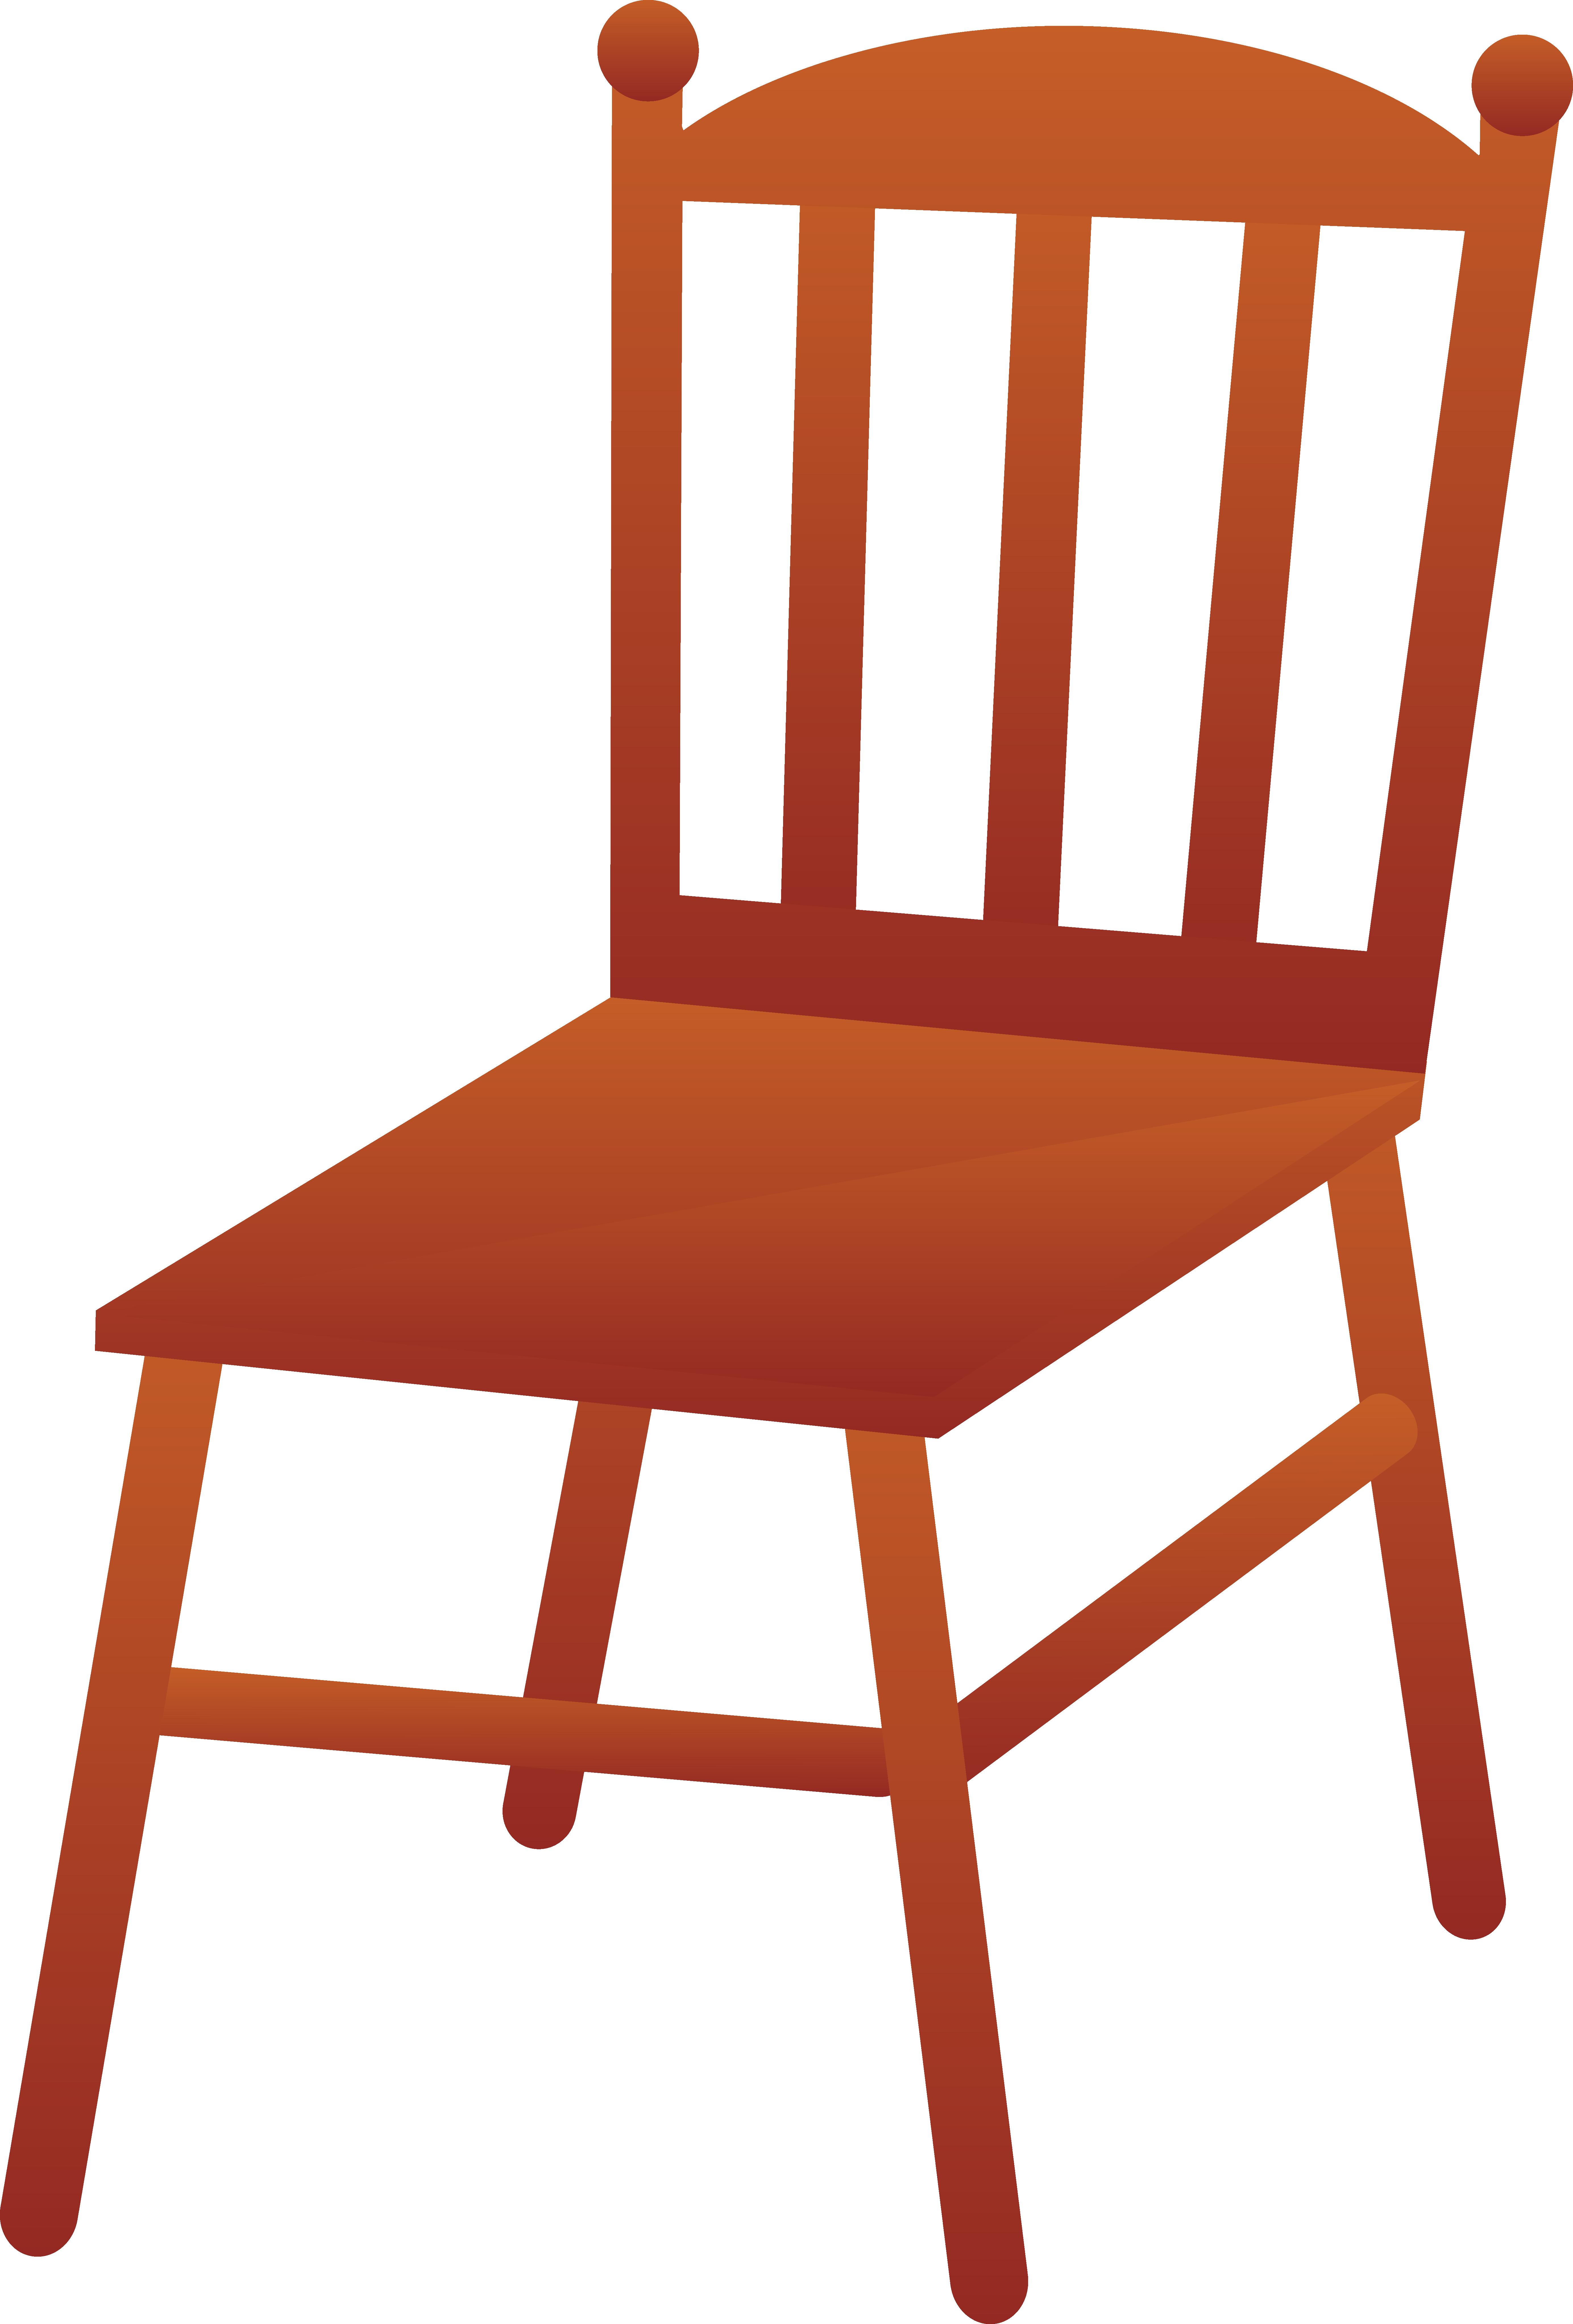 Classroom Chair Clipart